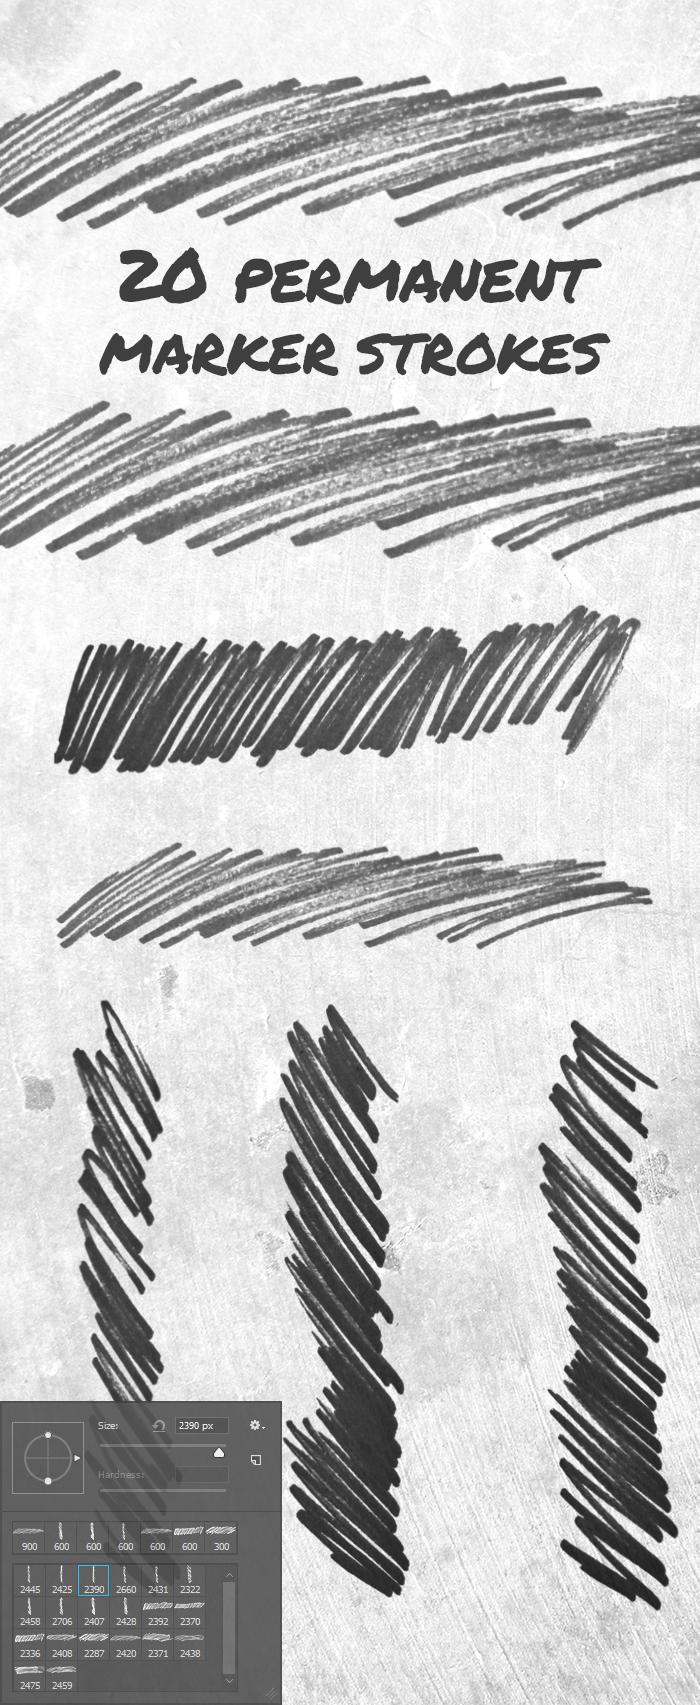 permant marker 1 20 permanent marker strokes